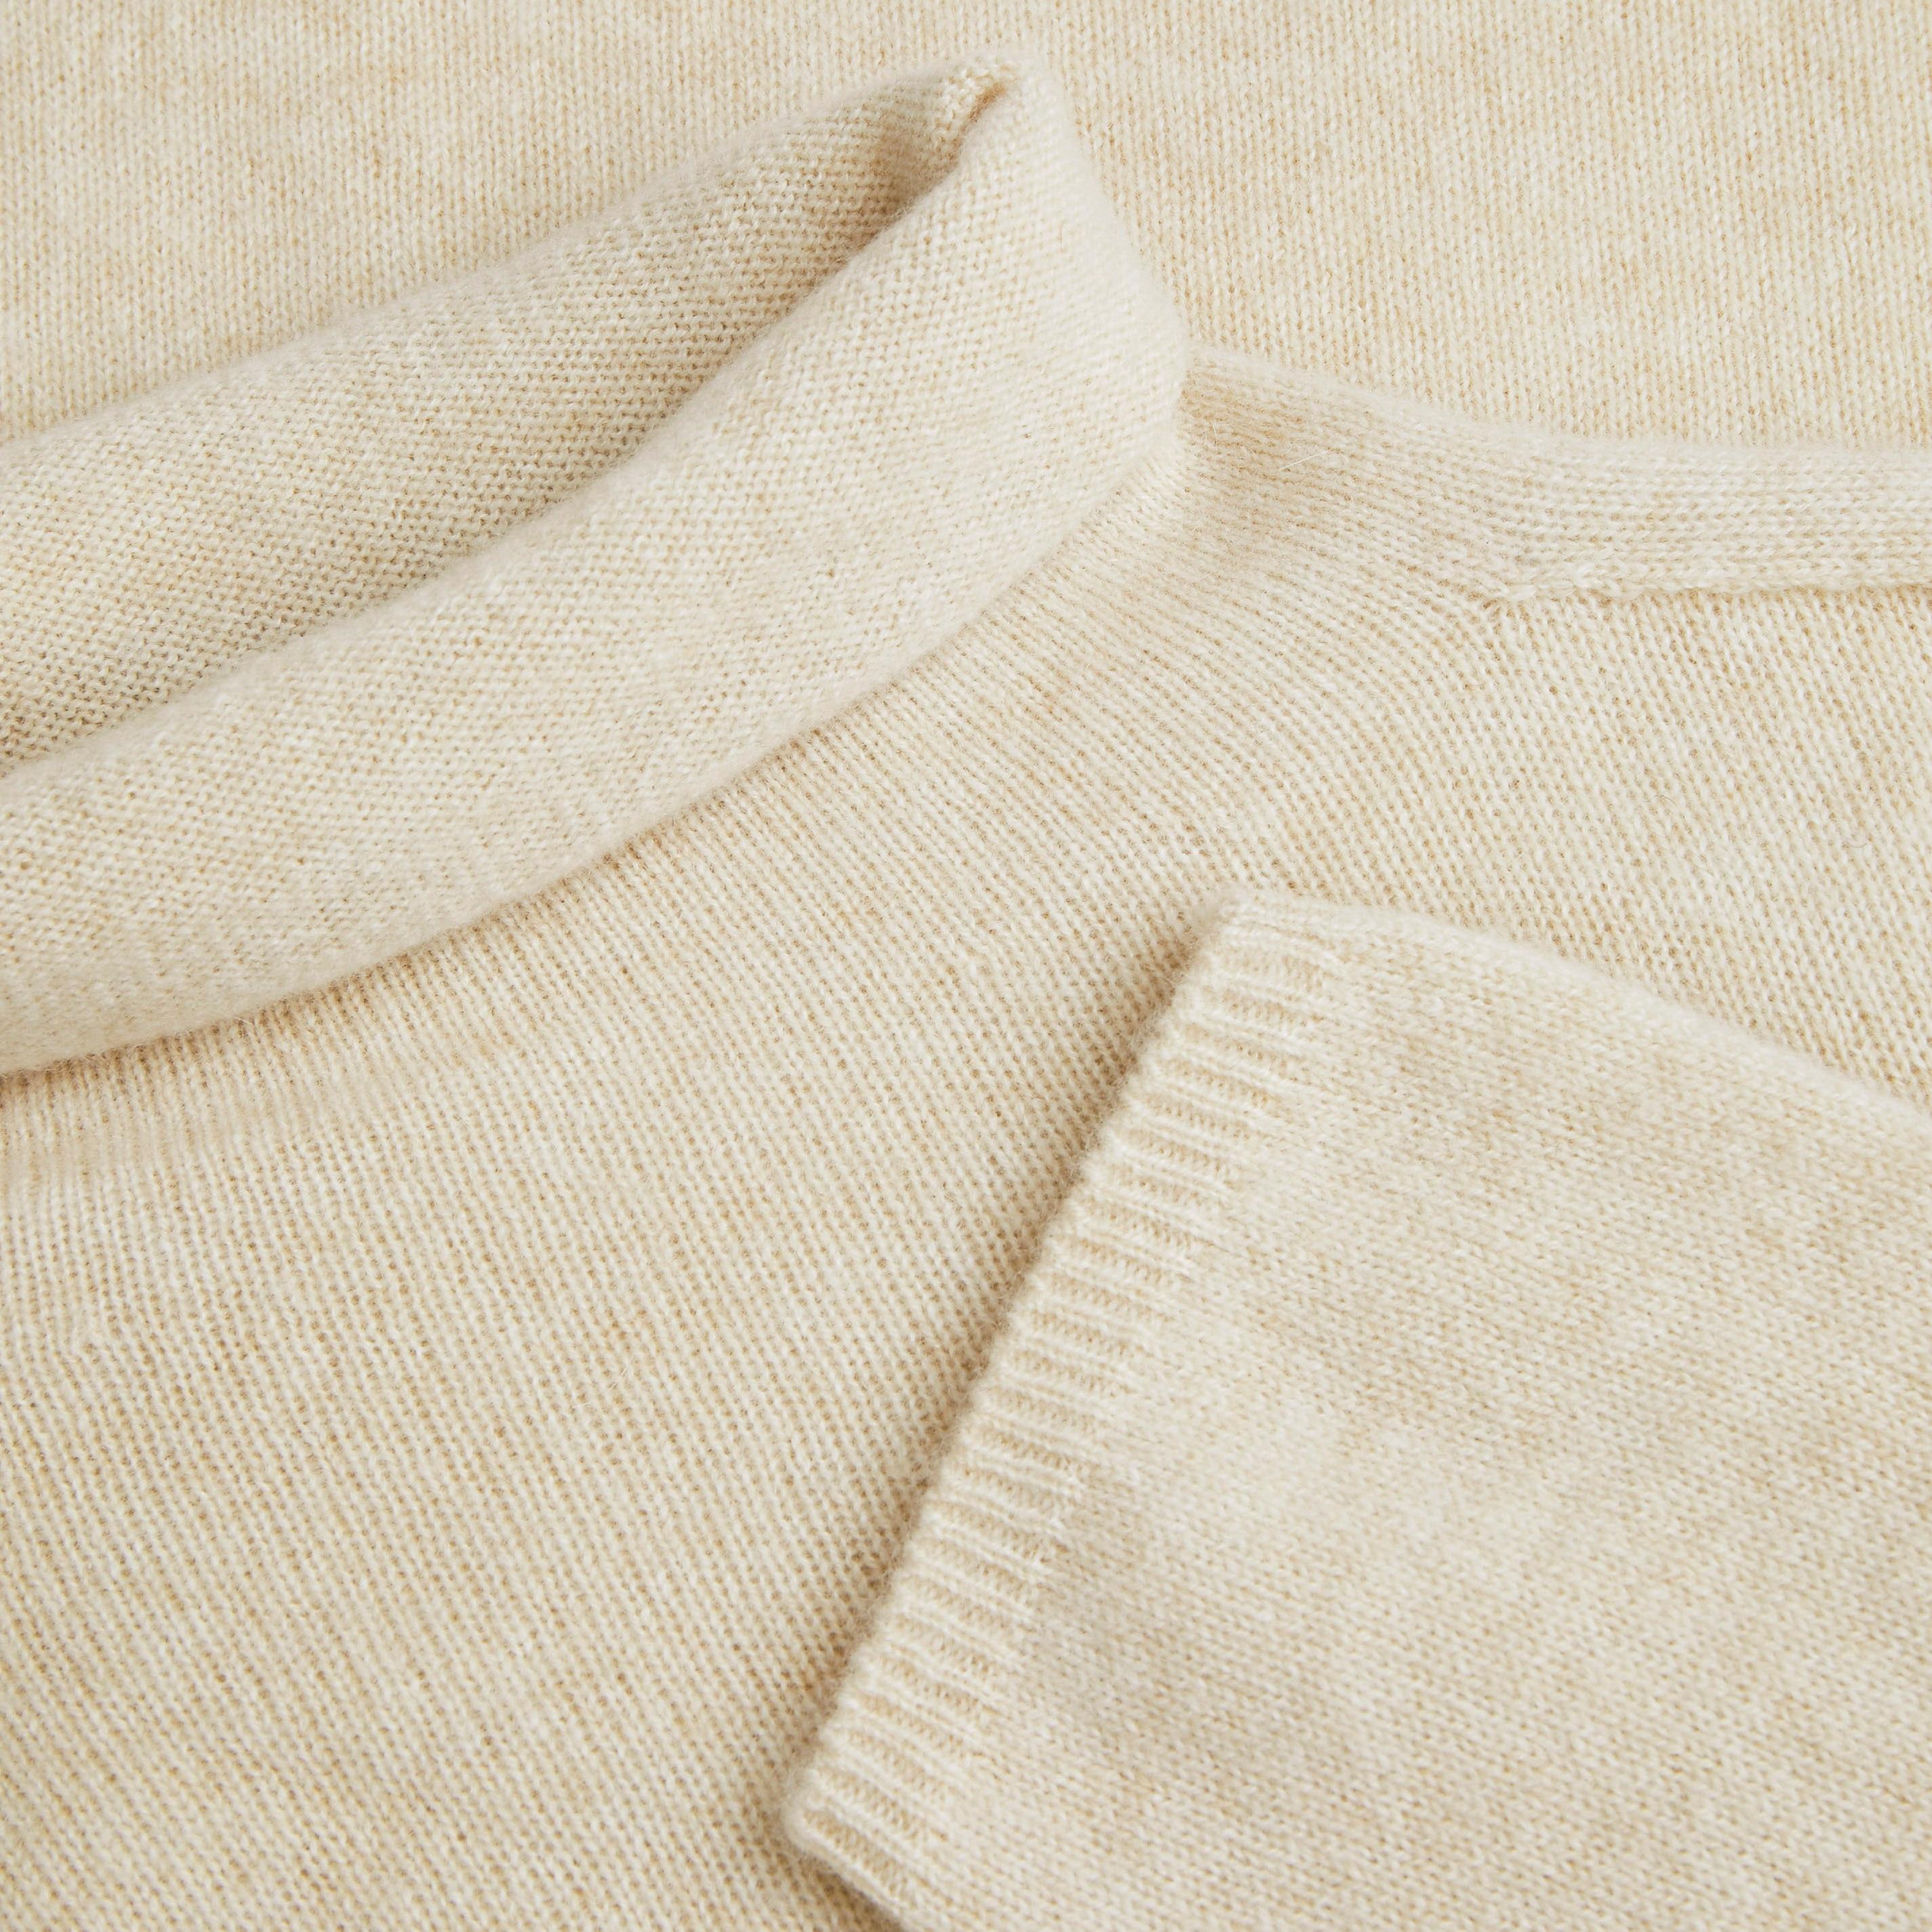 Cashmere Roll Neck Top-Cream Ivory - Cream Ivory S